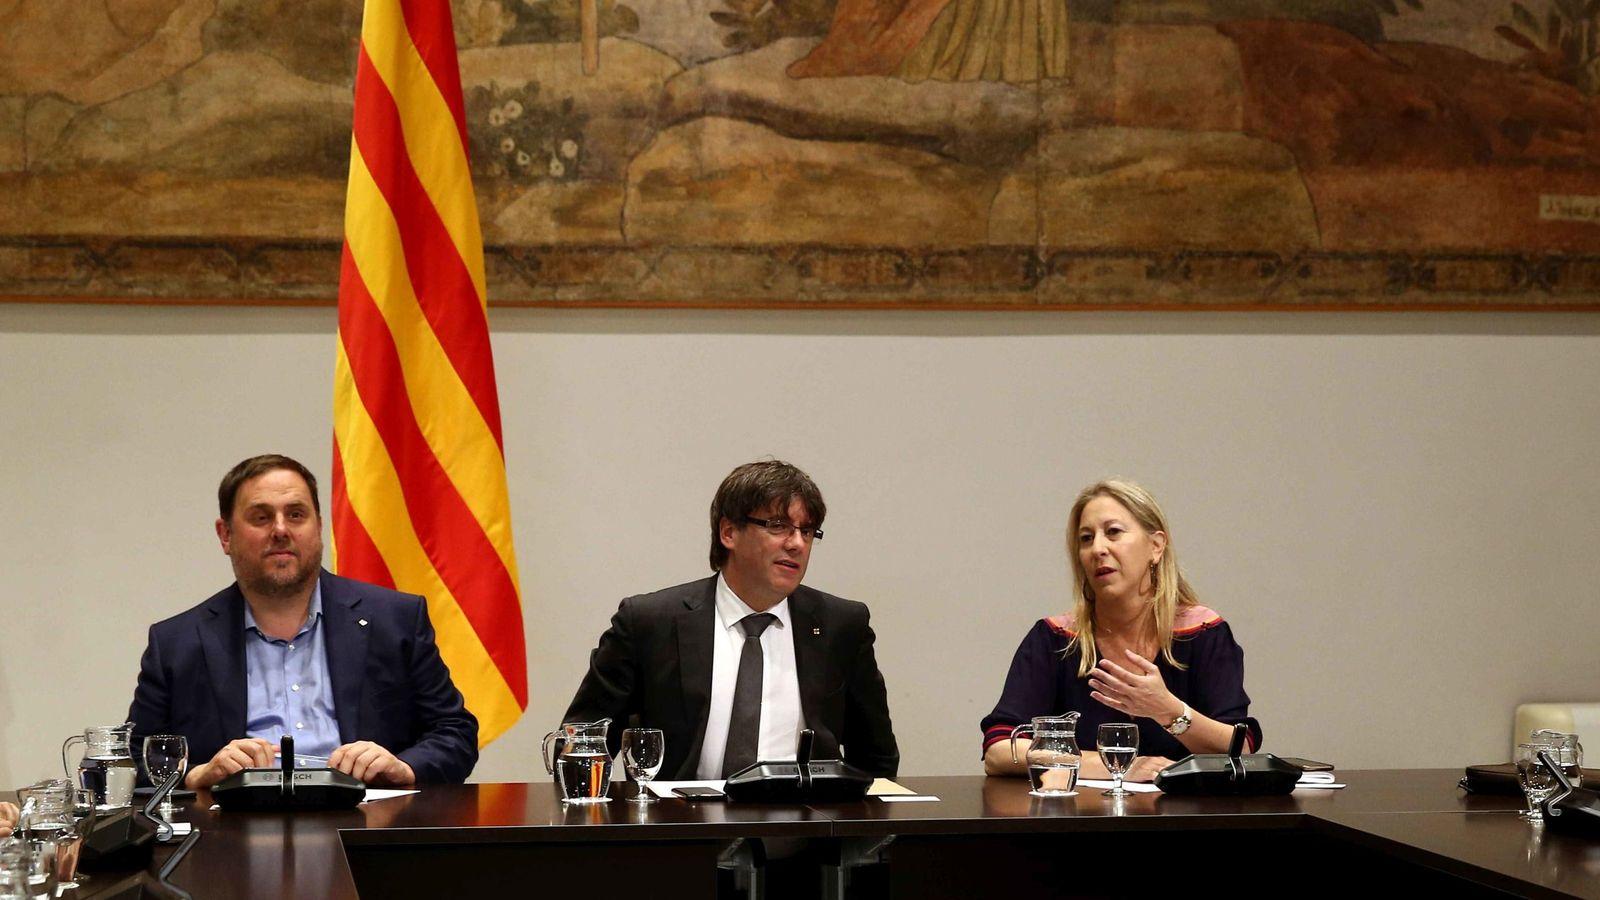 Foto: Carles Puigdemont, junto a Oriol Junqueras y Neus Munté. (EFE)